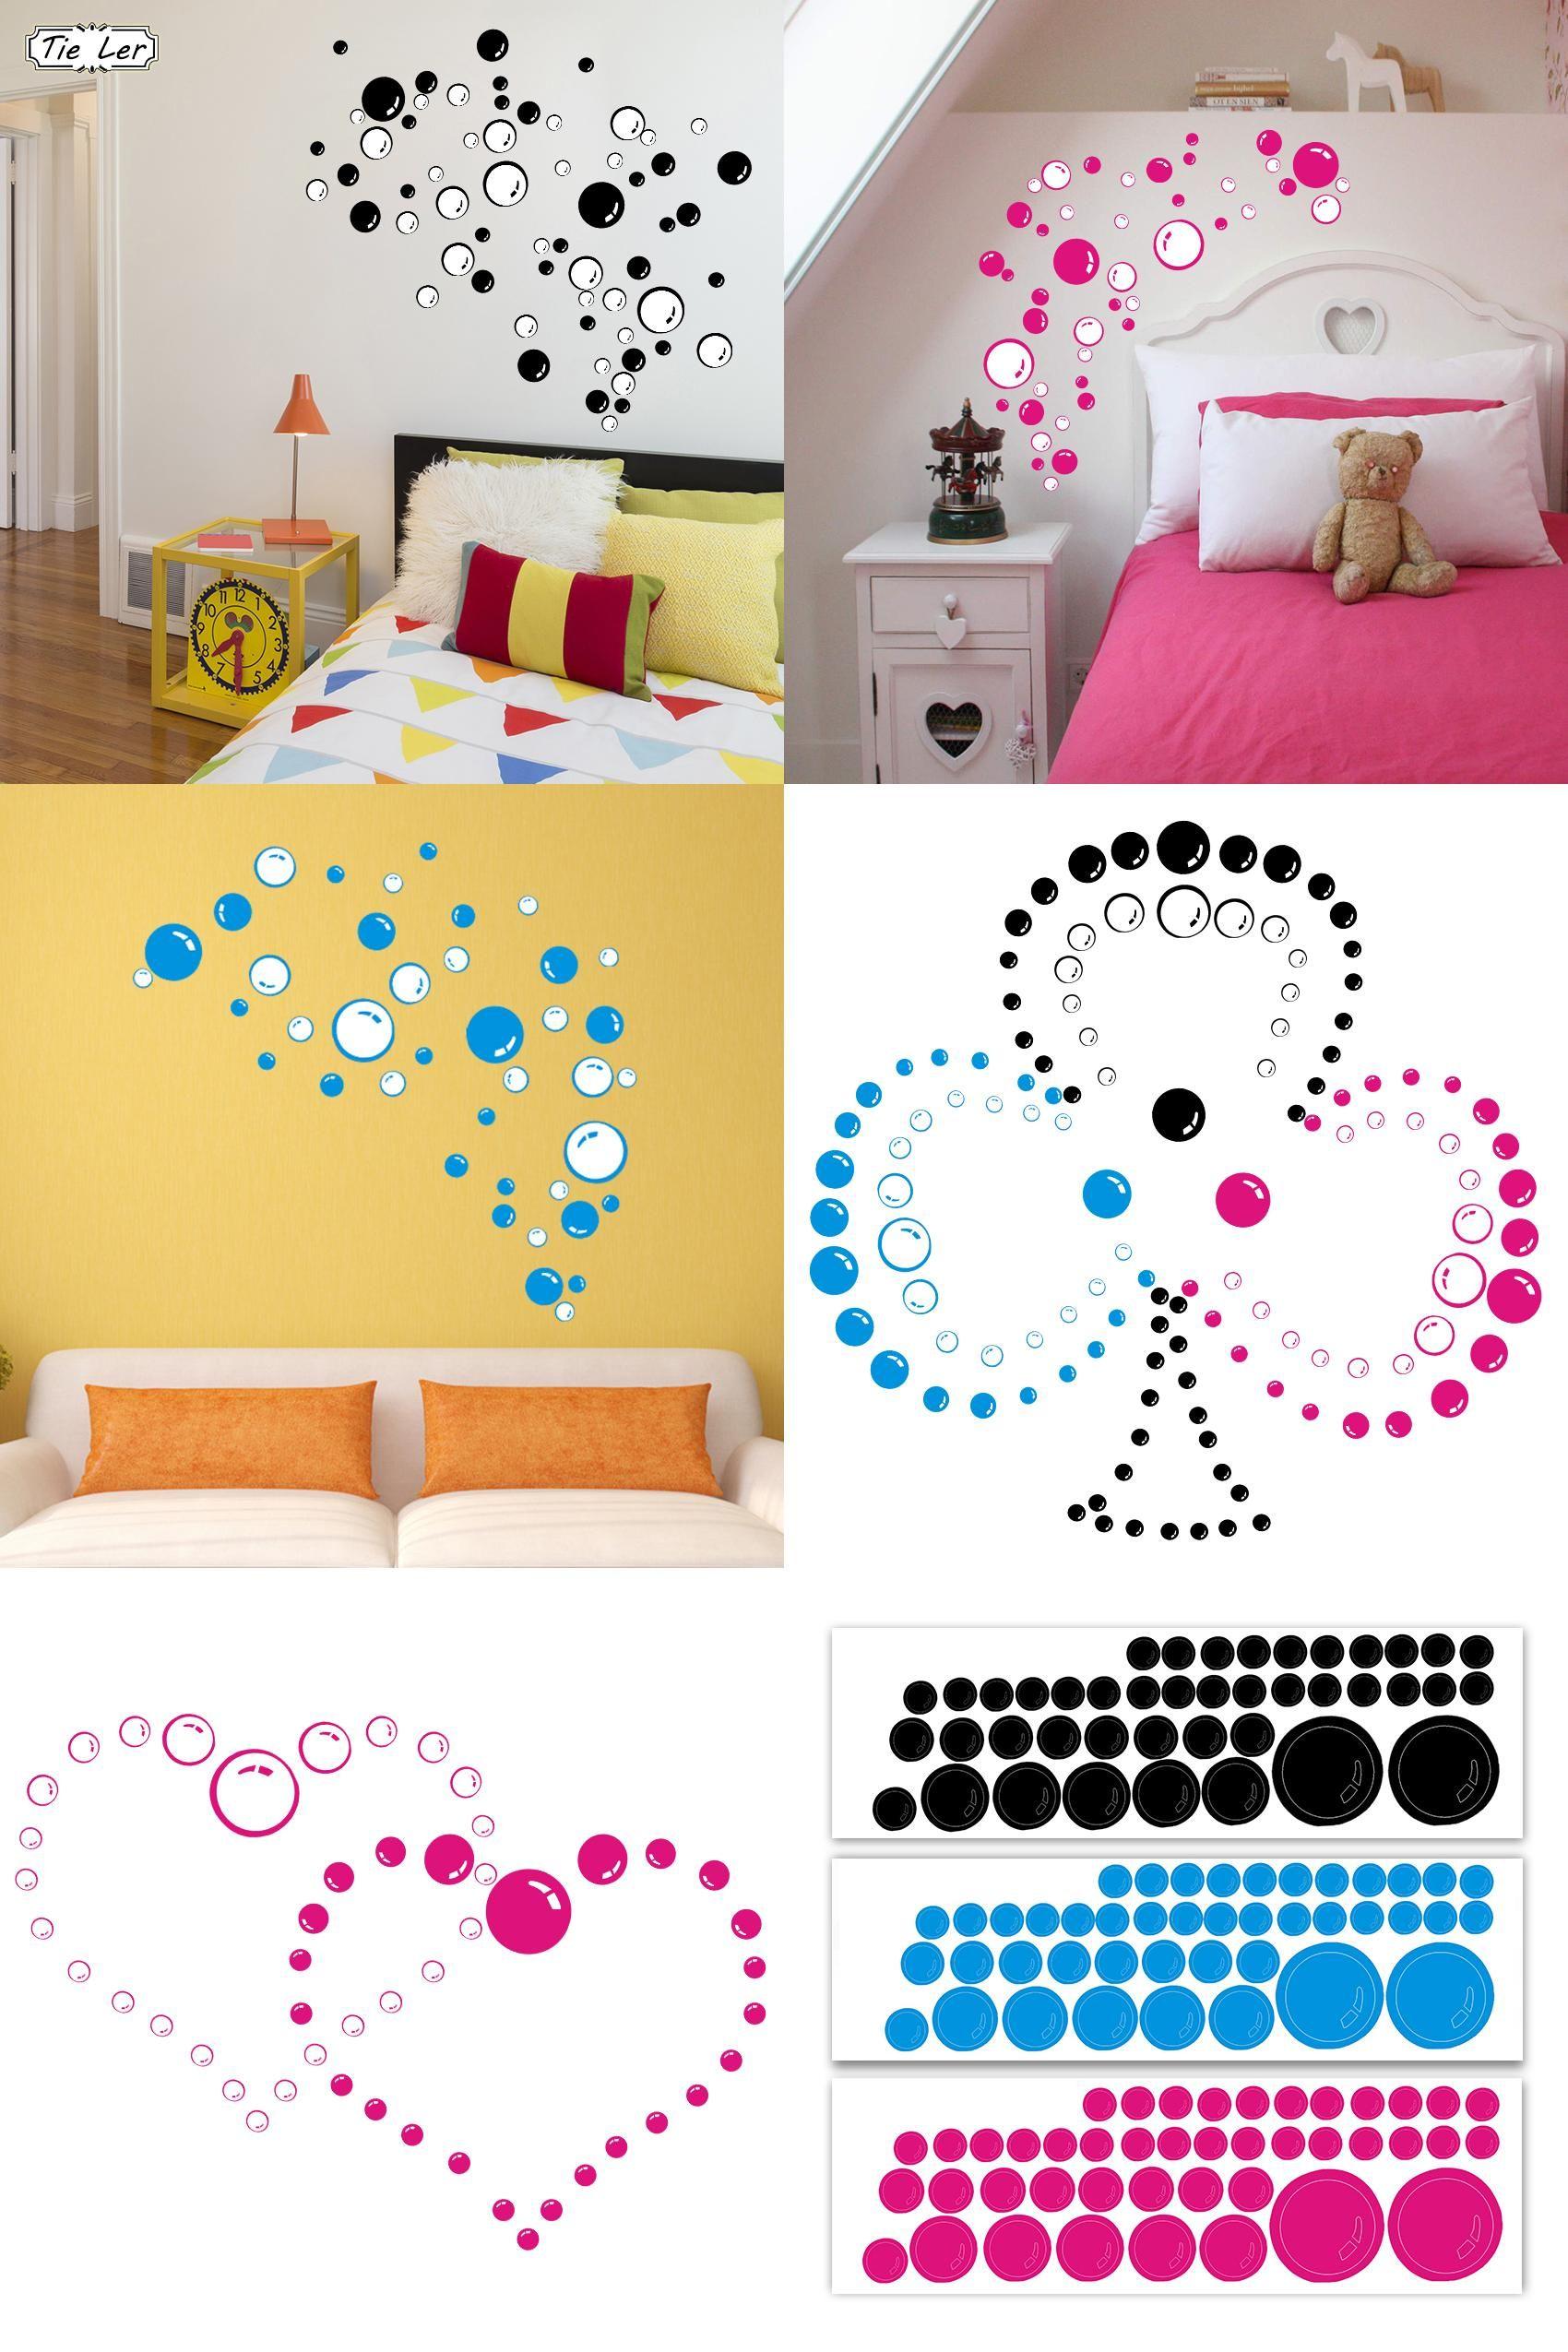 Visit to Buy] TIE LER Nursery Kitchen Bathroom Bubble Wall Sticker ...